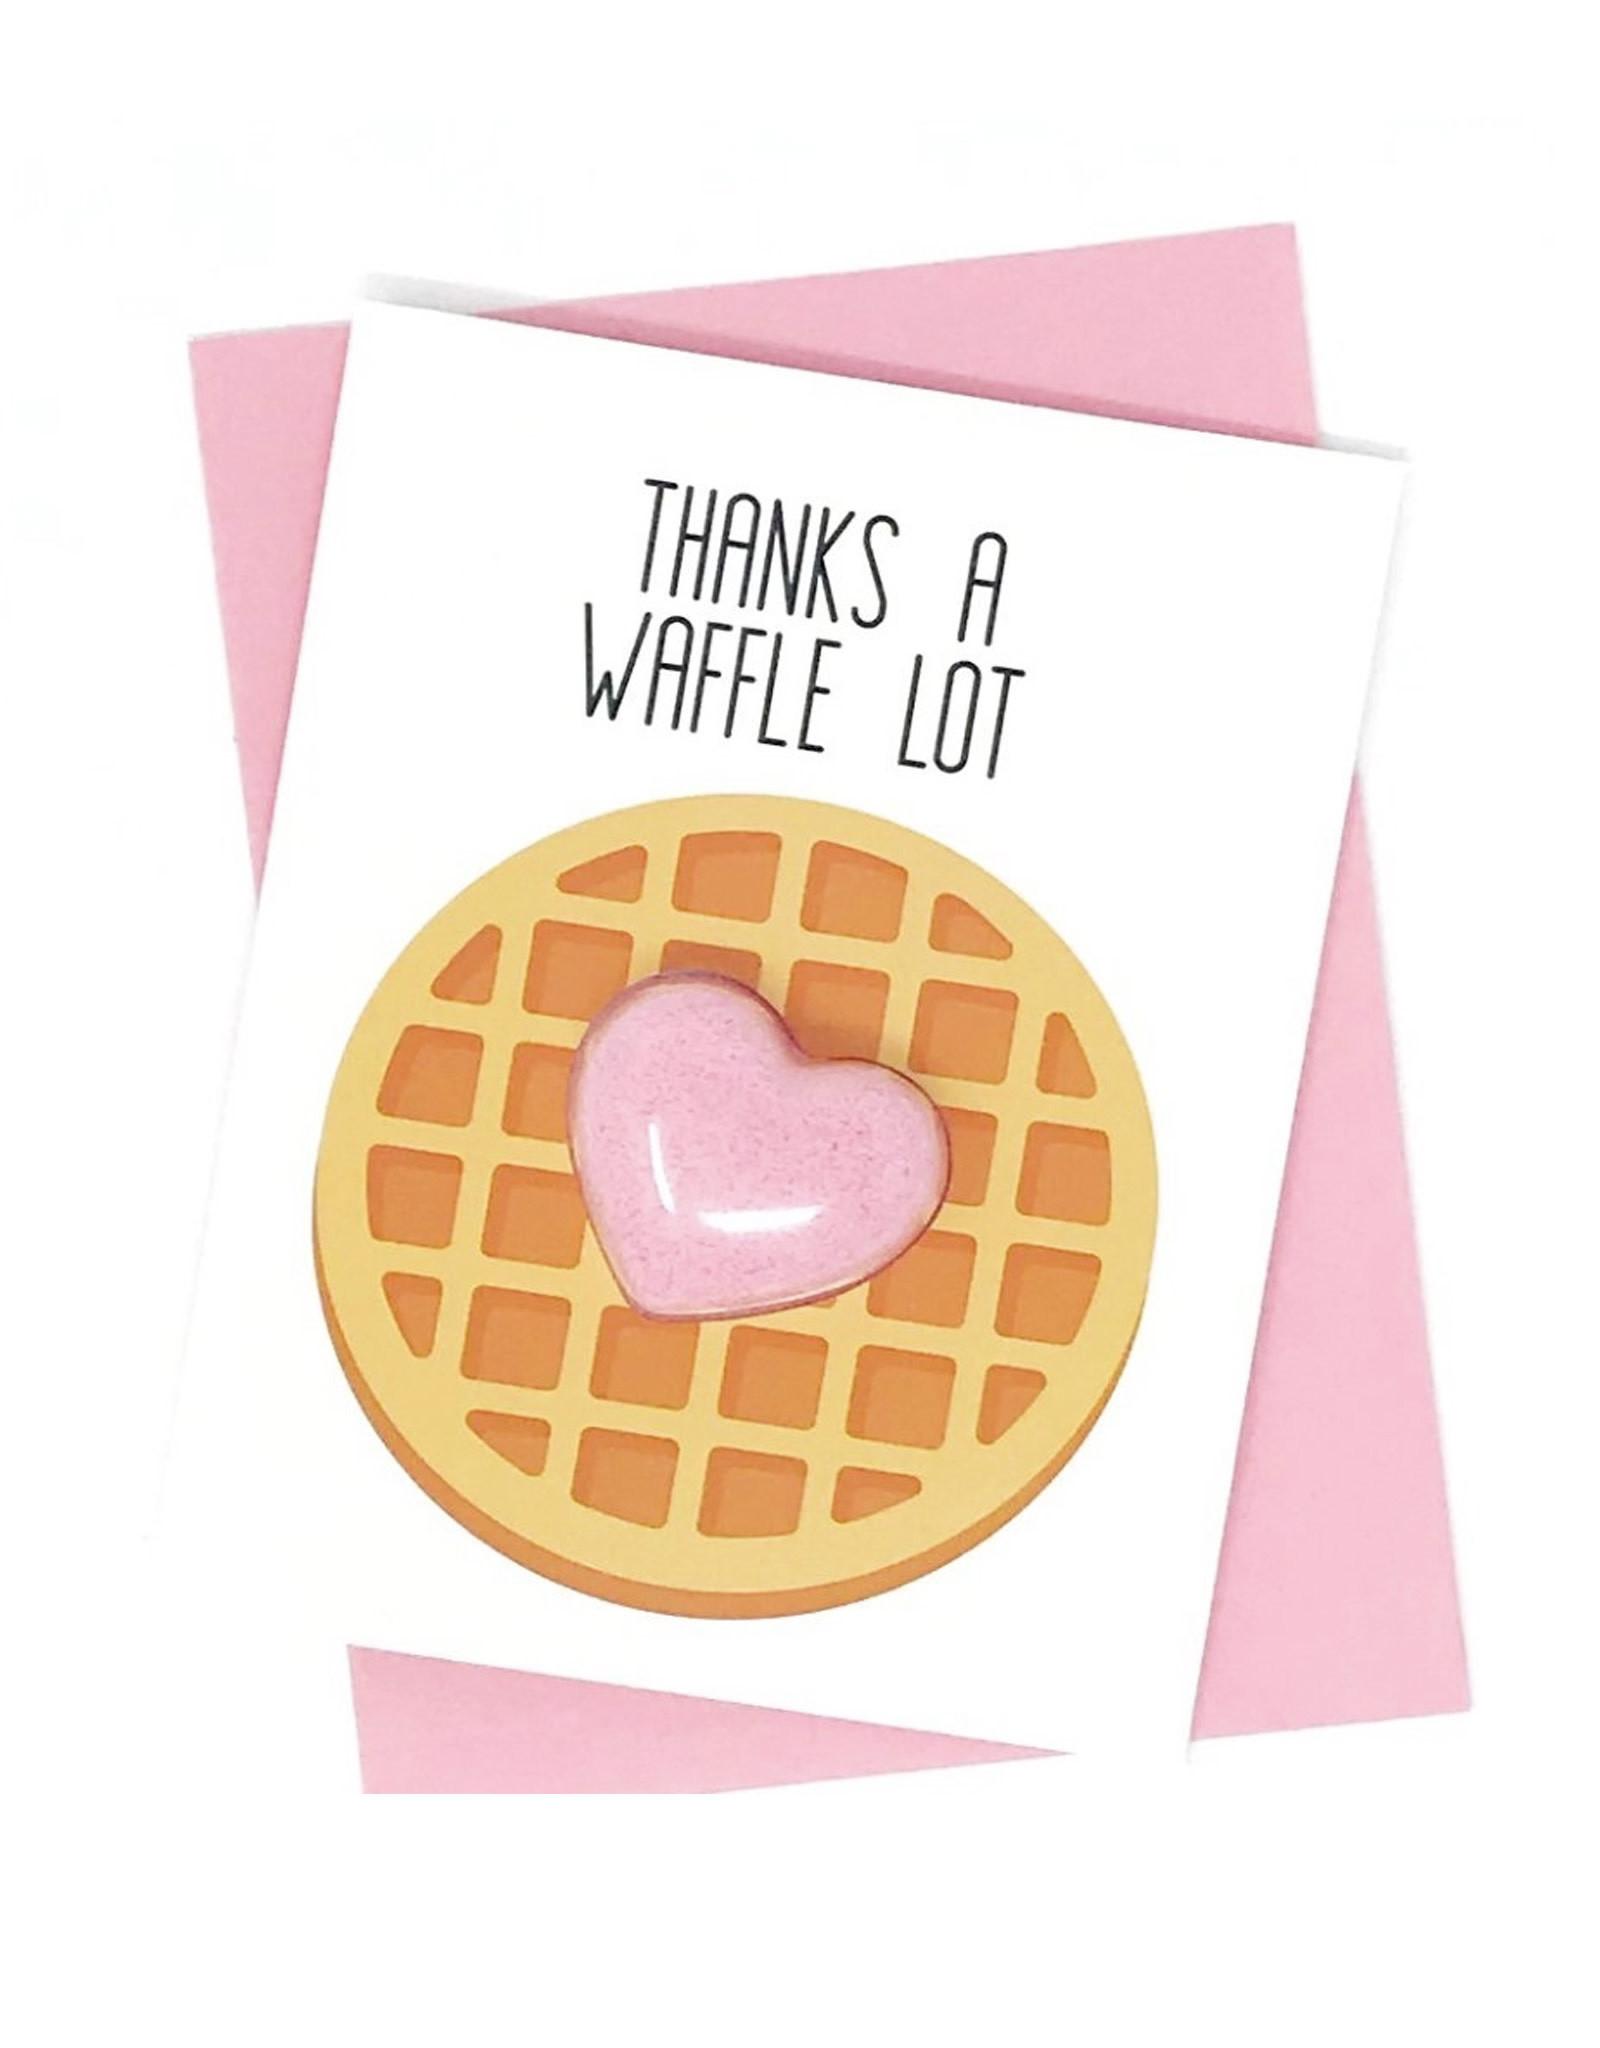 Feeling Smitten Thanks a Waffle Lot Bath Card